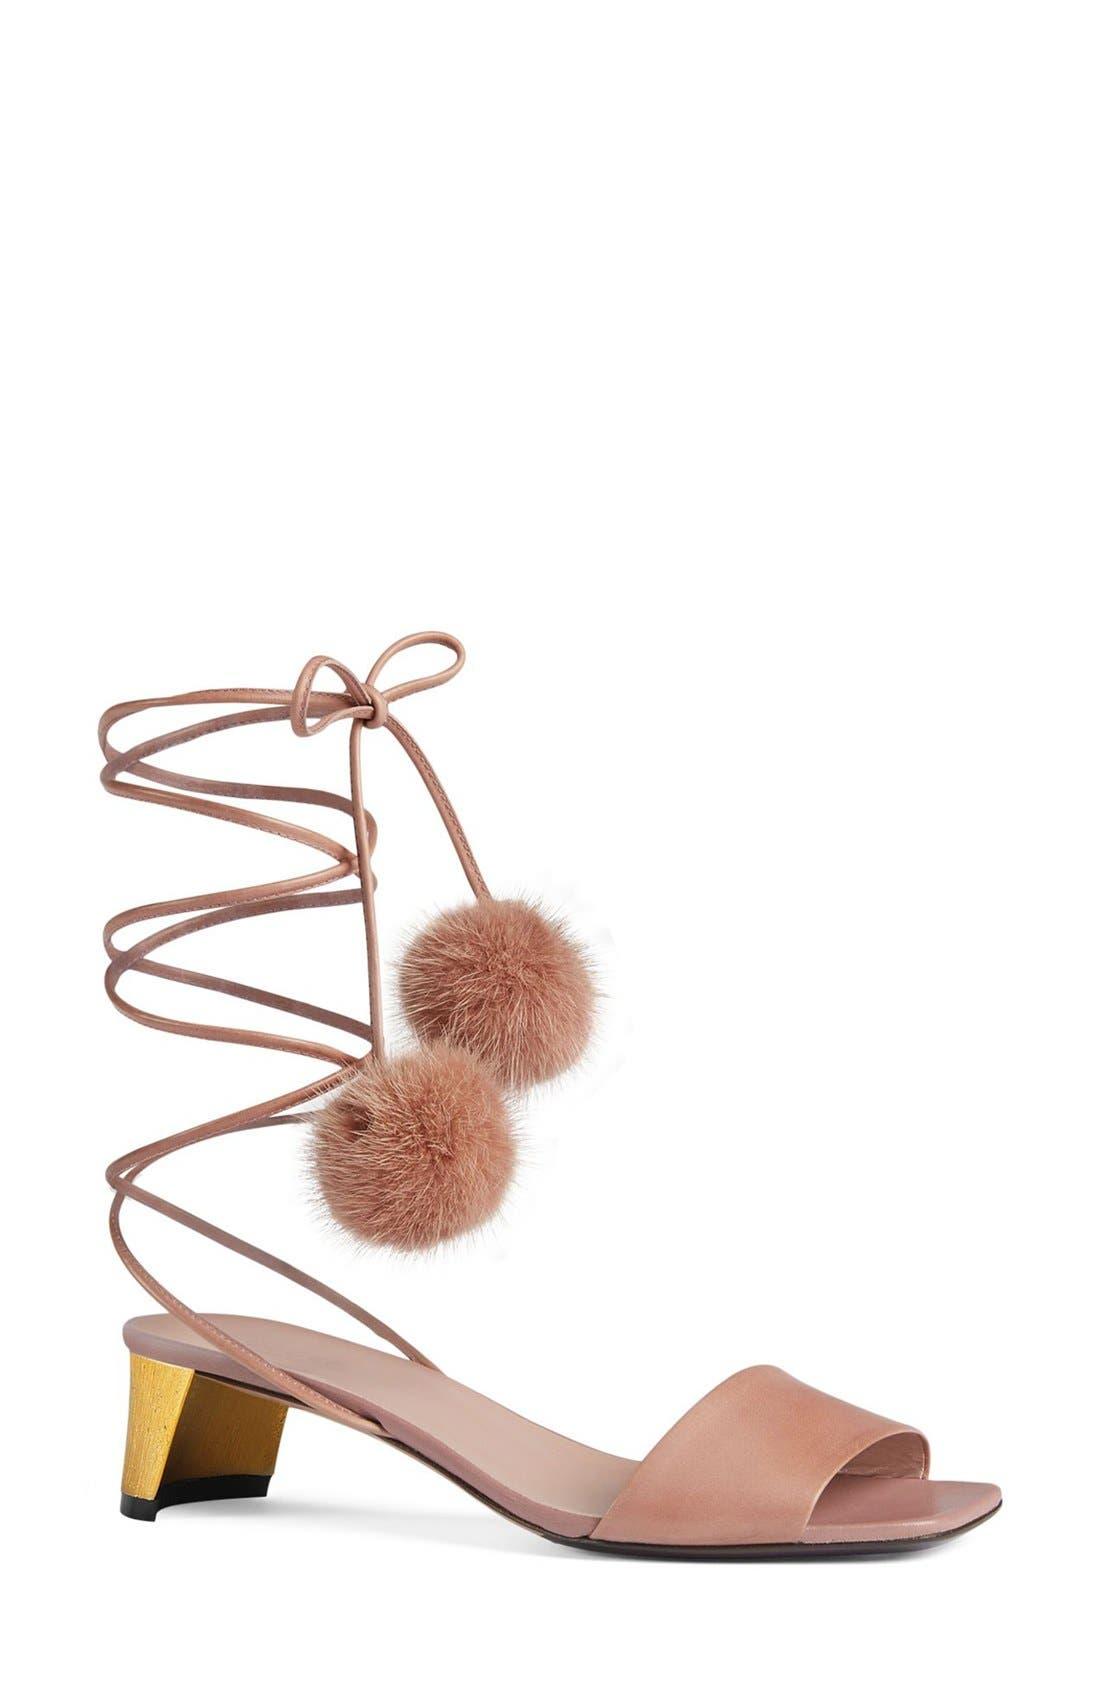 Alternate Image 1 Selected - Gucci 'Heloise' Sandal (Women)